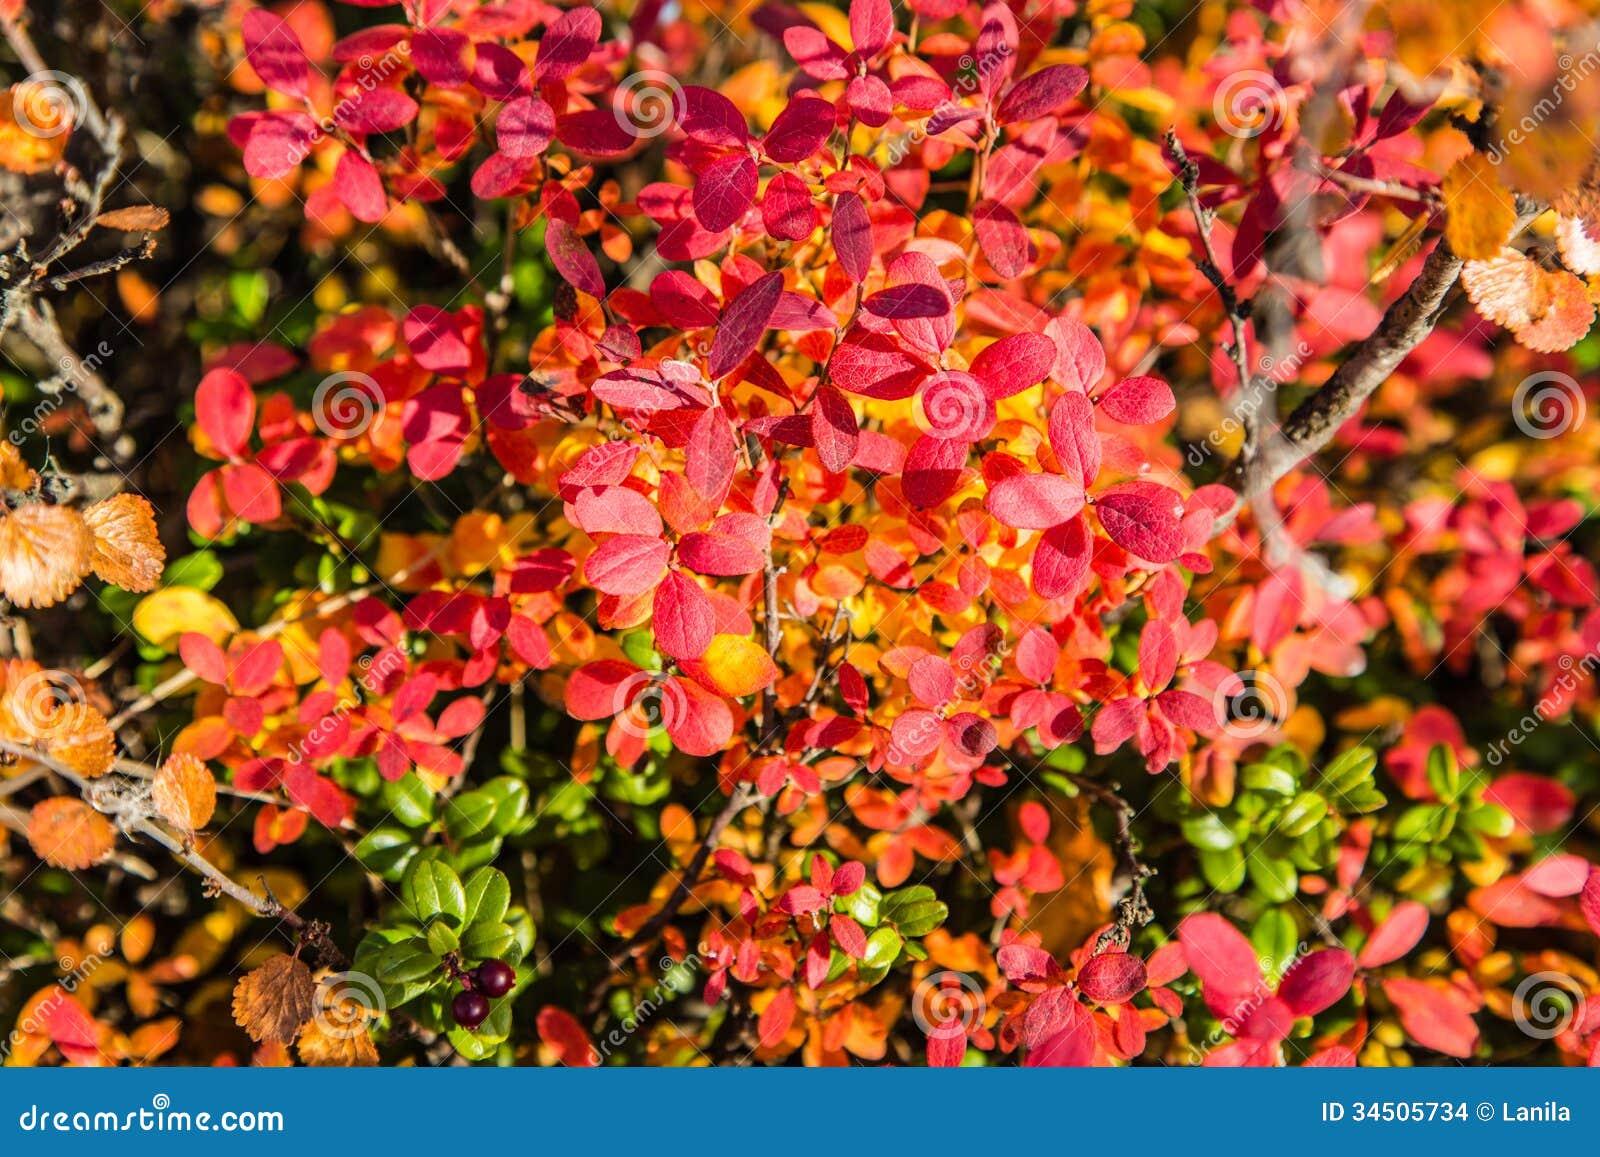 Northern Bush Berries Stock Photo Image Of October